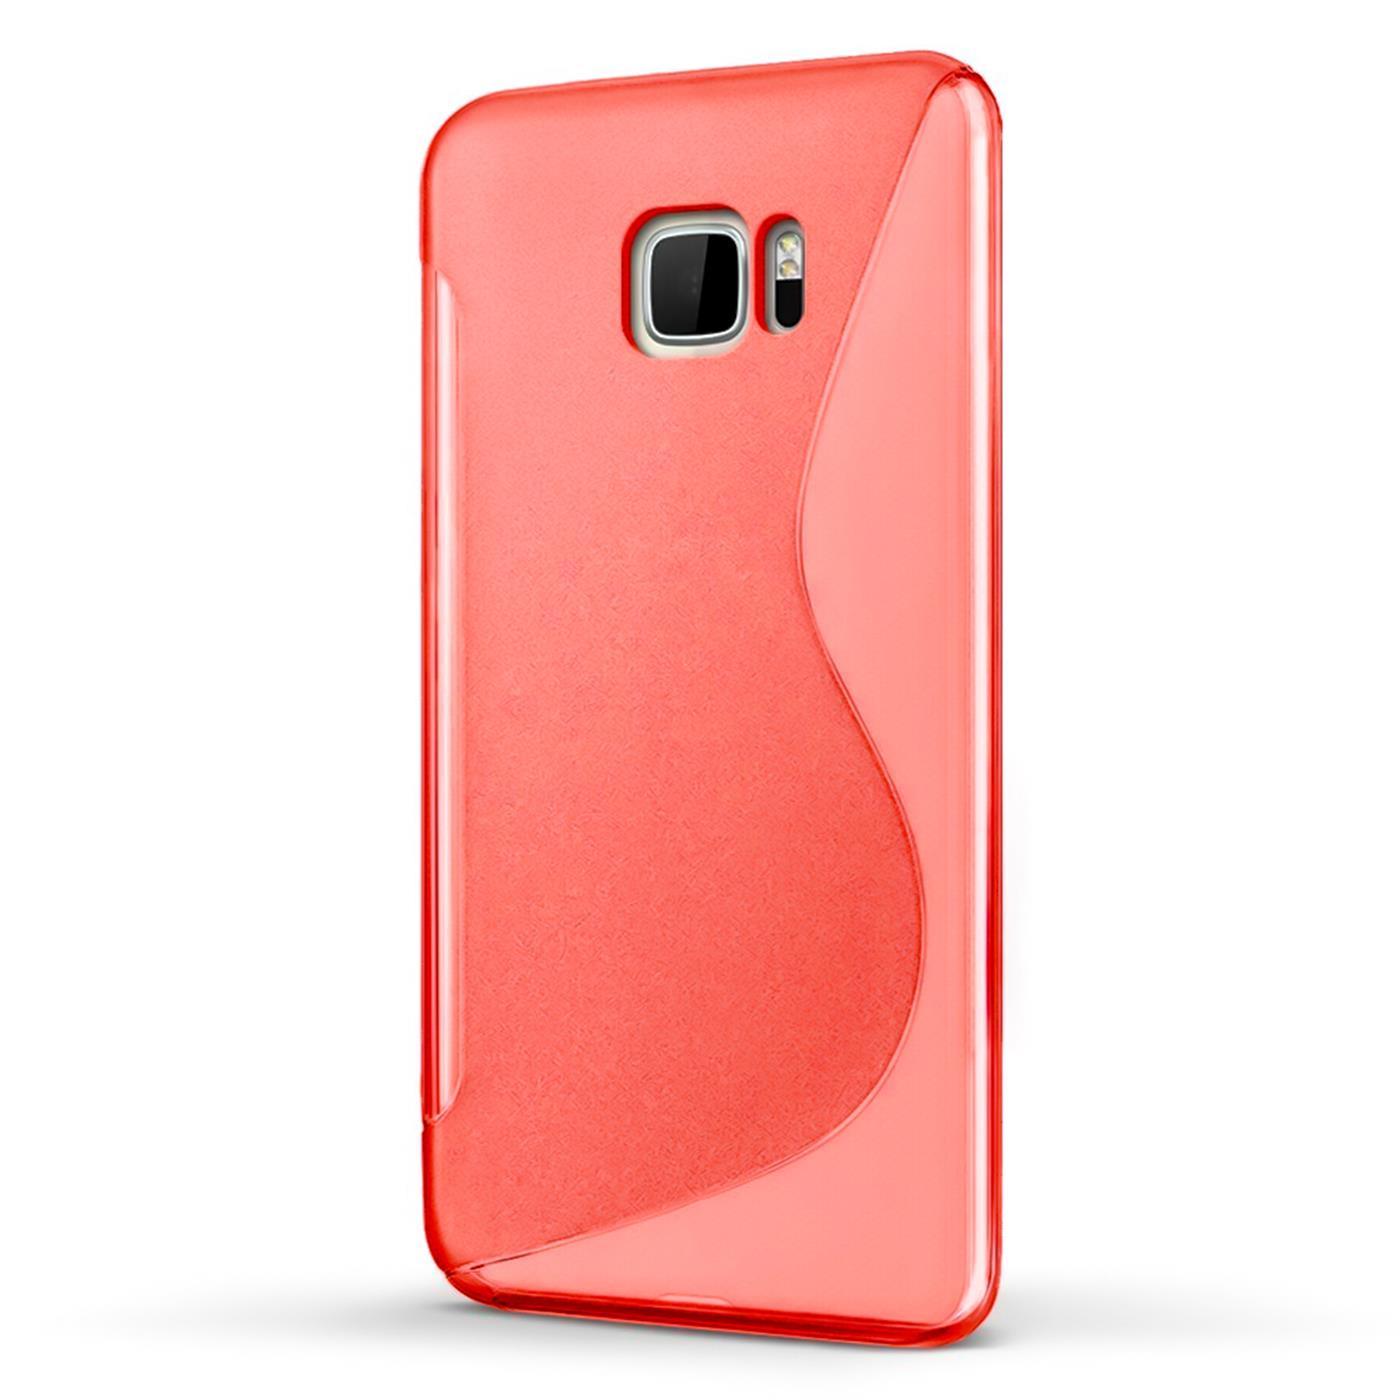 HTC-One-m9-Silikon-Gel-S-Line-Case-Cover-Ultra-Thin-Slim-Back-Bumper Indexbild 16